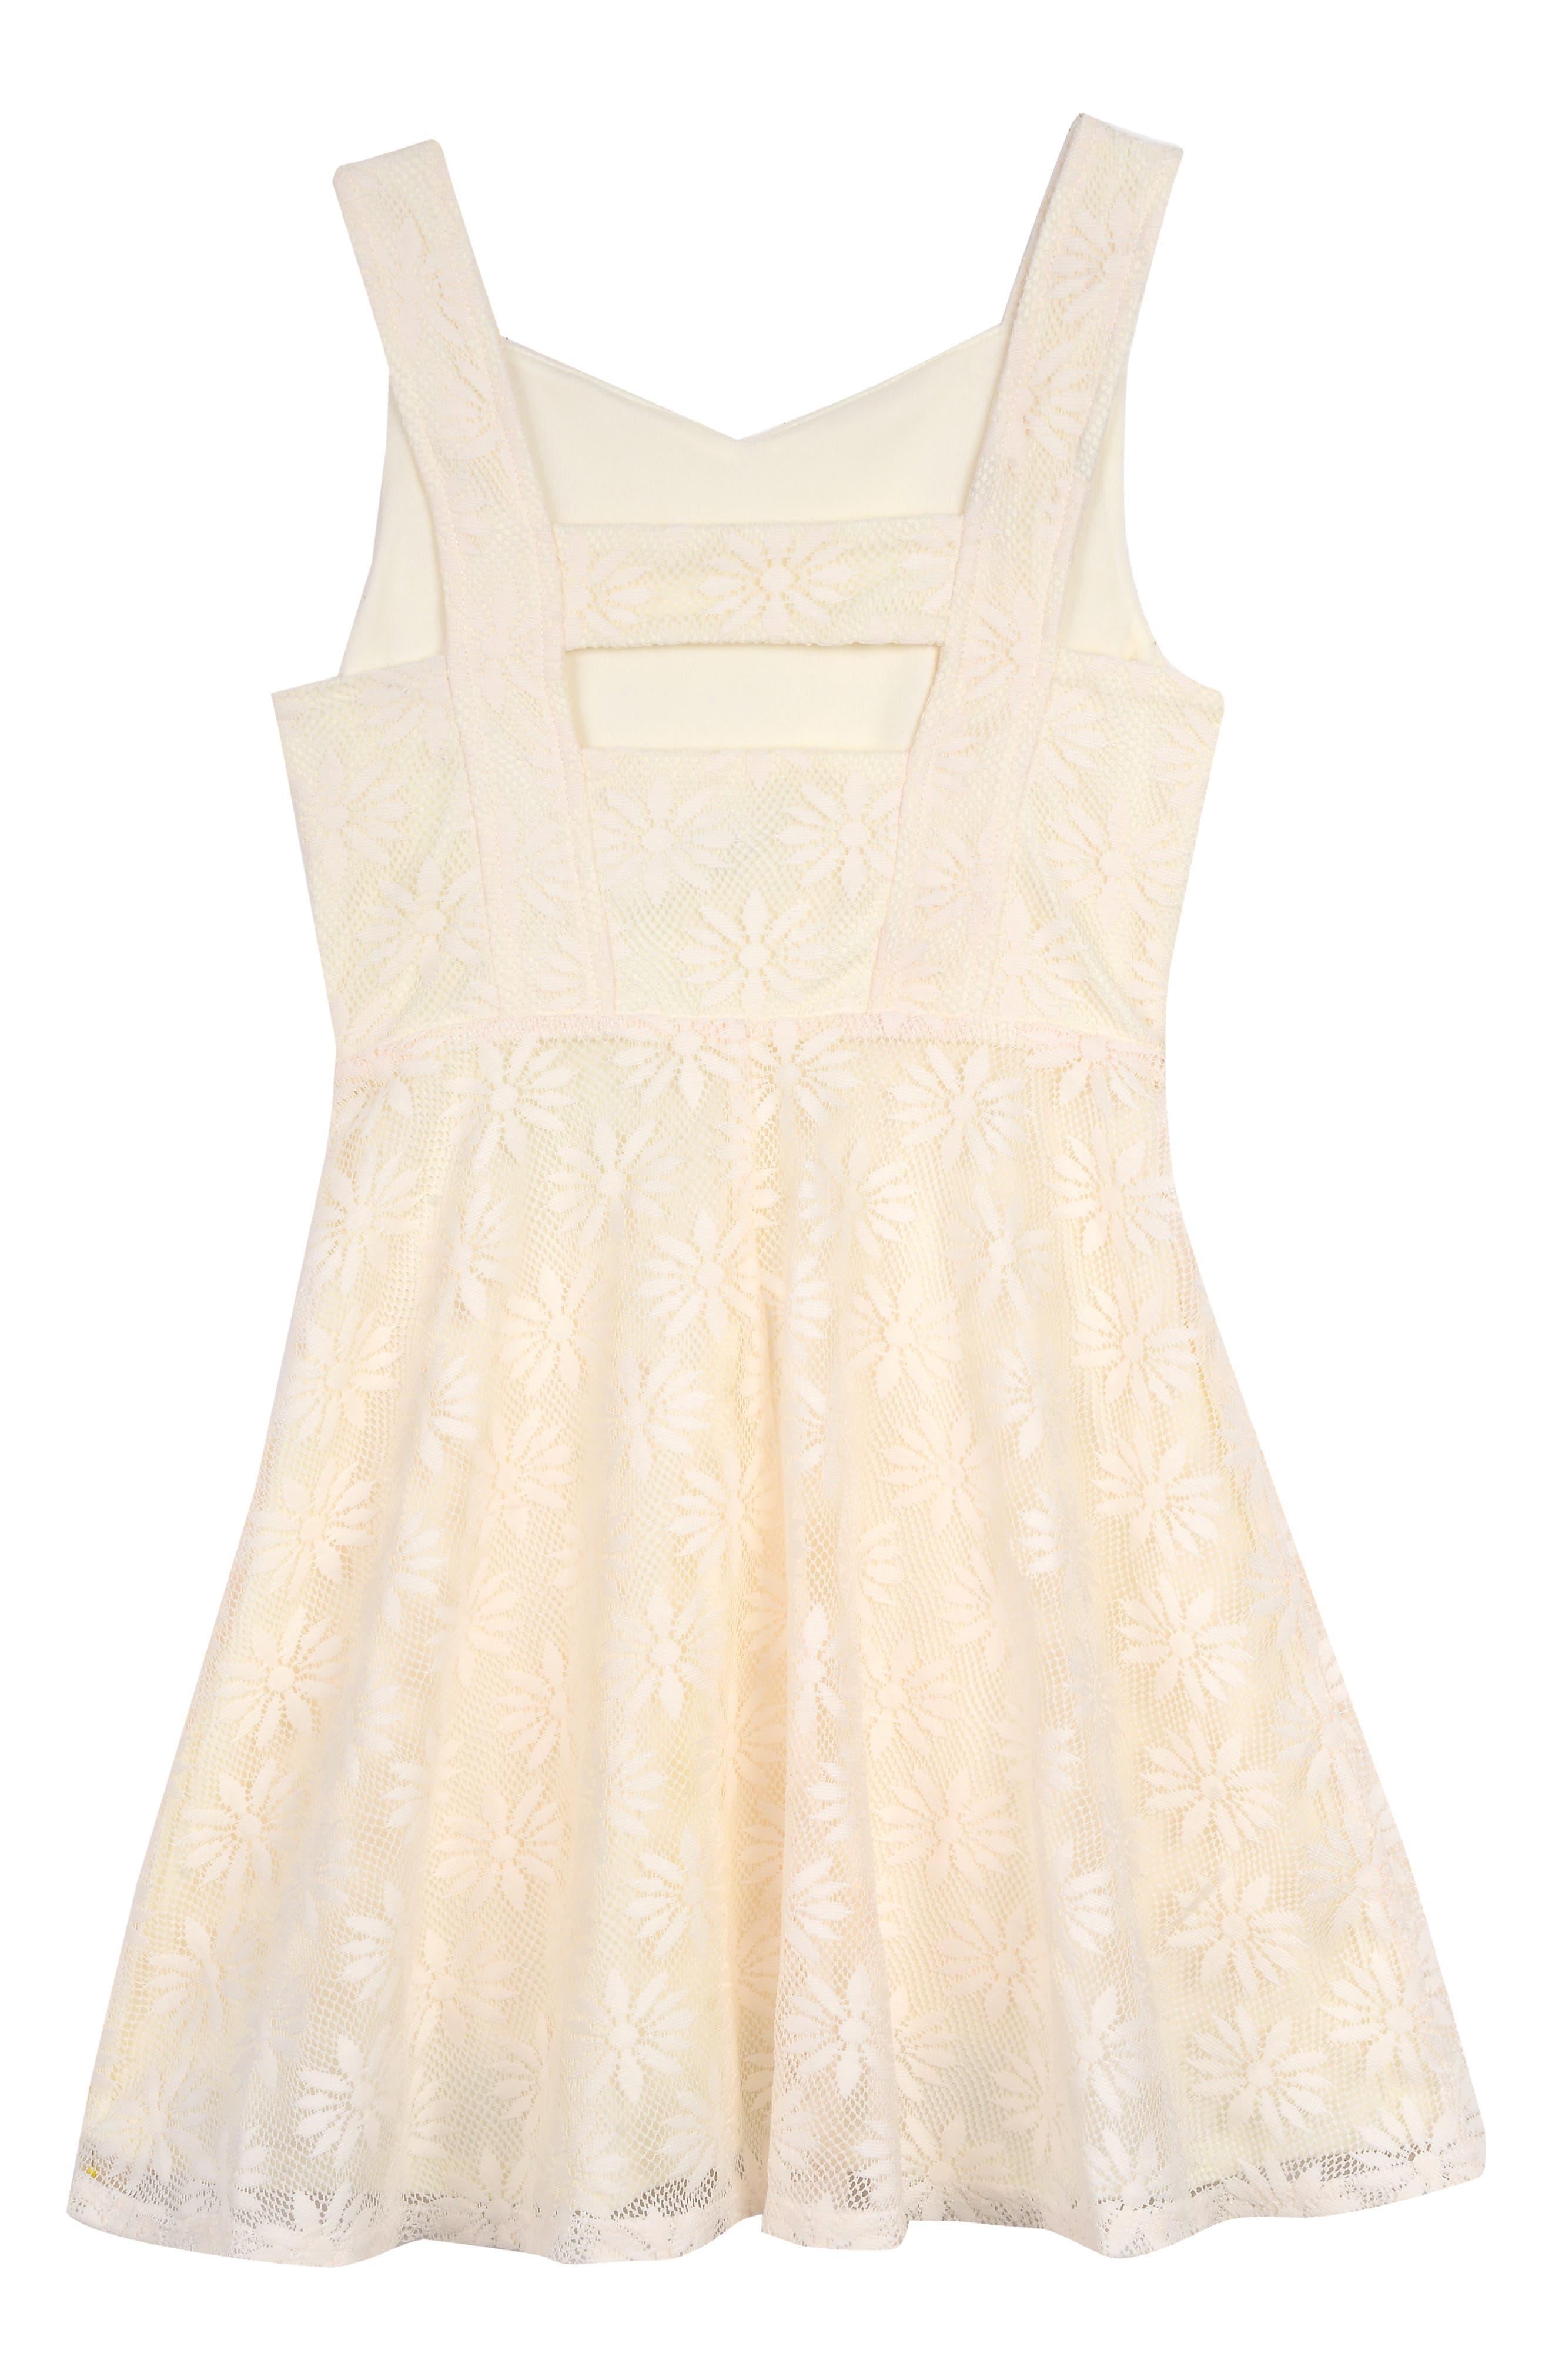 PIPPA & JULIE, Daisy Mesh Dress, Alternate thumbnail 2, color, YELLOW